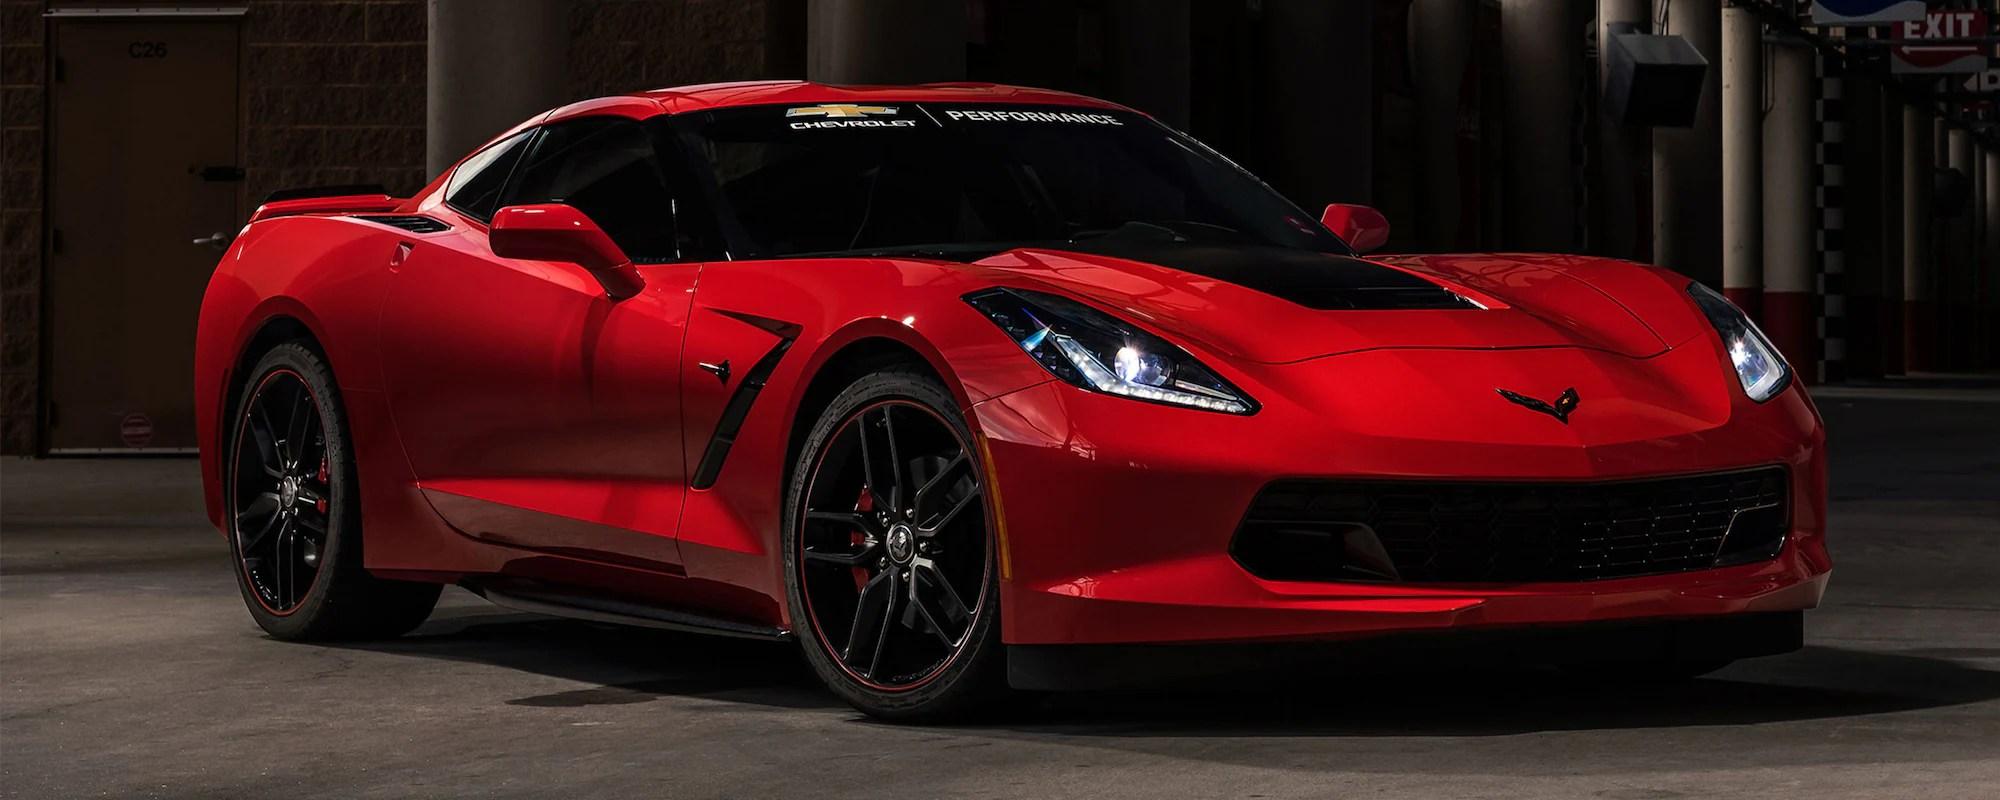 2017 chevrolet corvette sports car vehicle upgrades [ 2048 x 819 Pixel ]